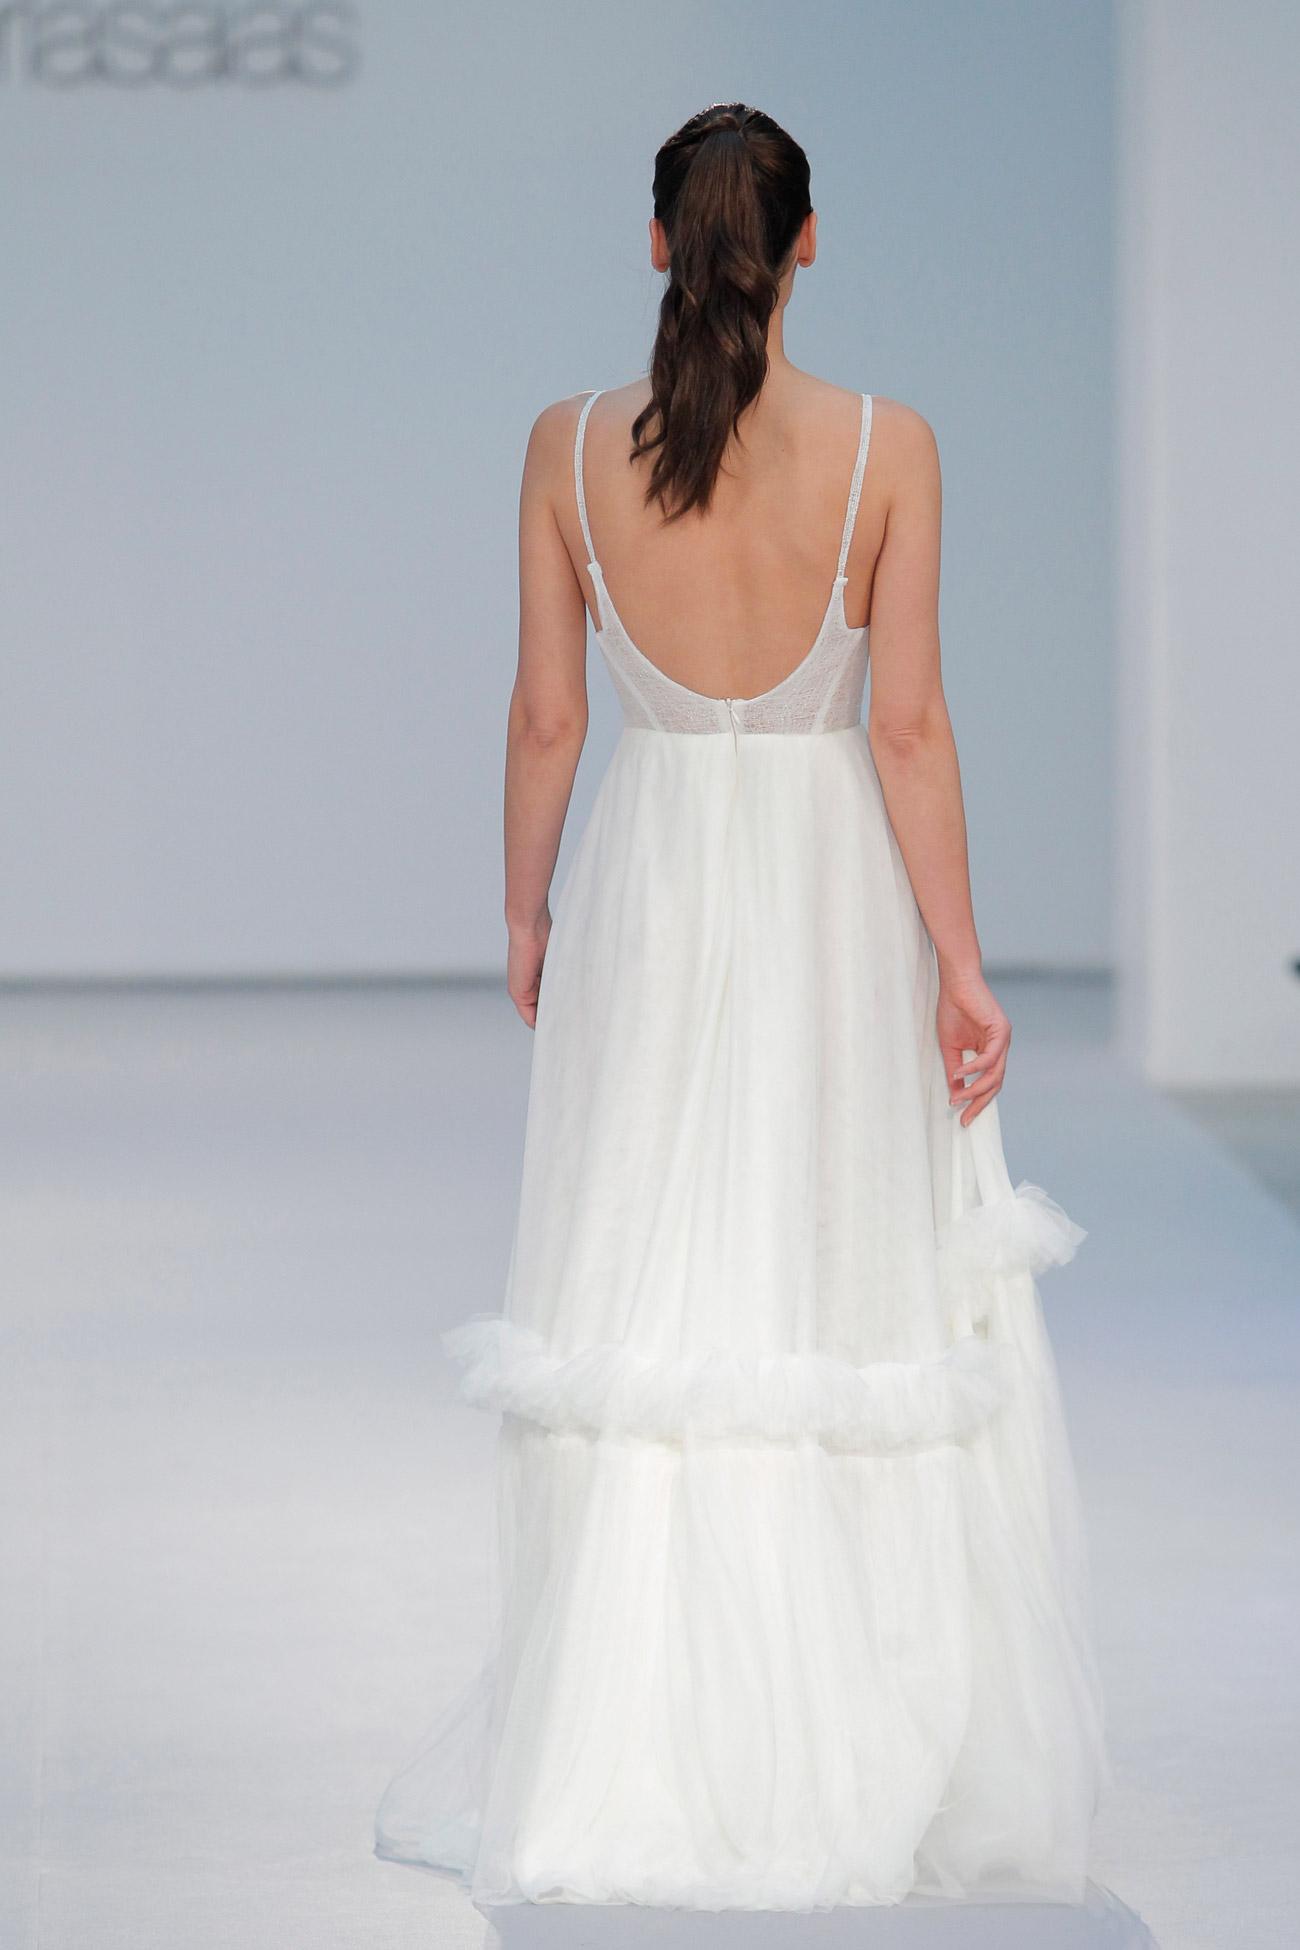 Novias2017-Pasarela-Costura-Victoria-Salas